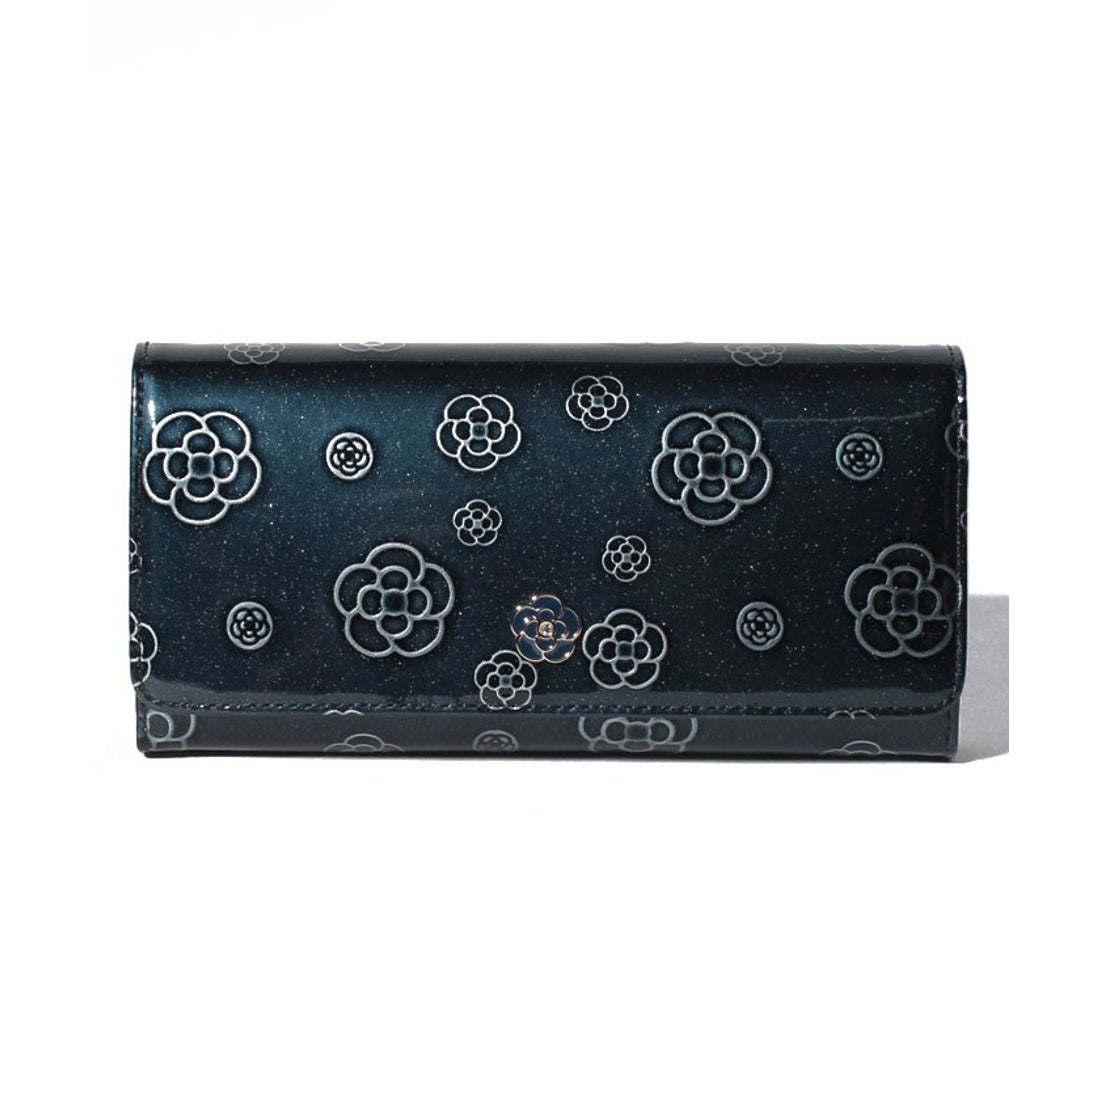 1726de81839c クレイサス CLATHAS アルゴ フラップ長財布 (ネイビー) -靴&ファッション通販 ロコンド〜自宅で試着、気軽に返品